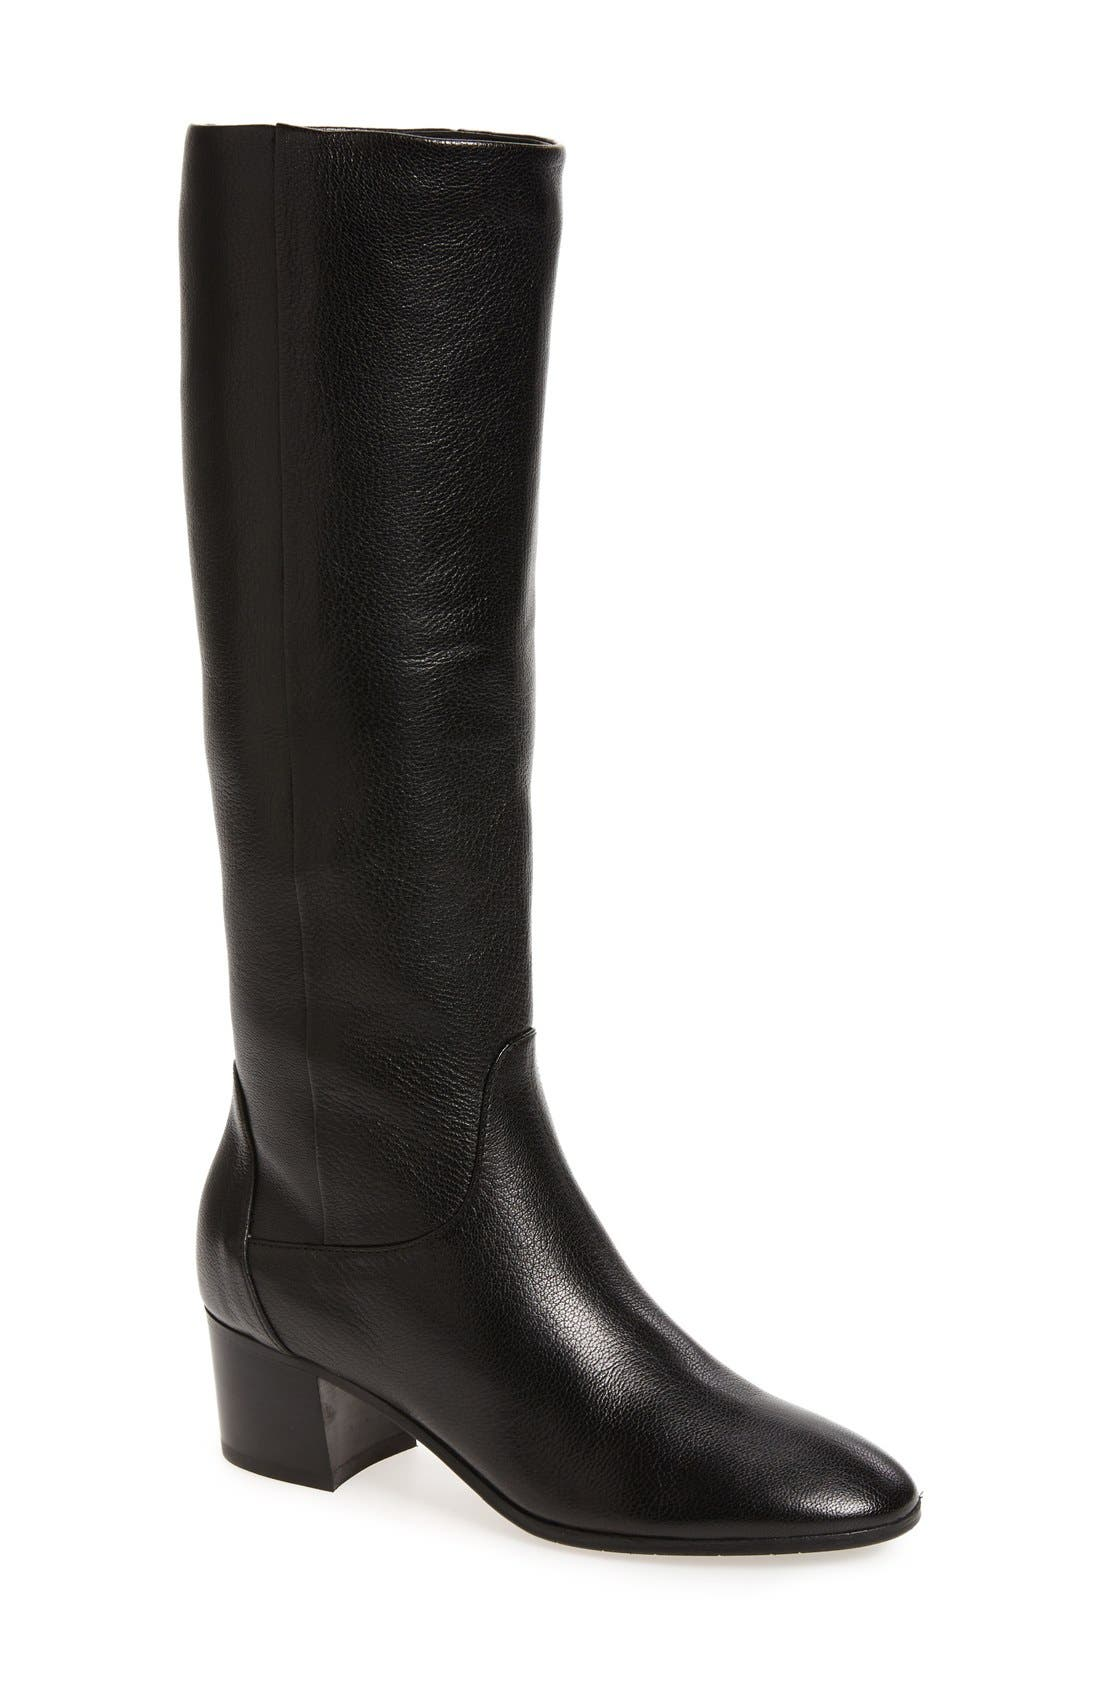 AQUATALIA Deanna Weatherproof Knee High Boot, Main, color, 001